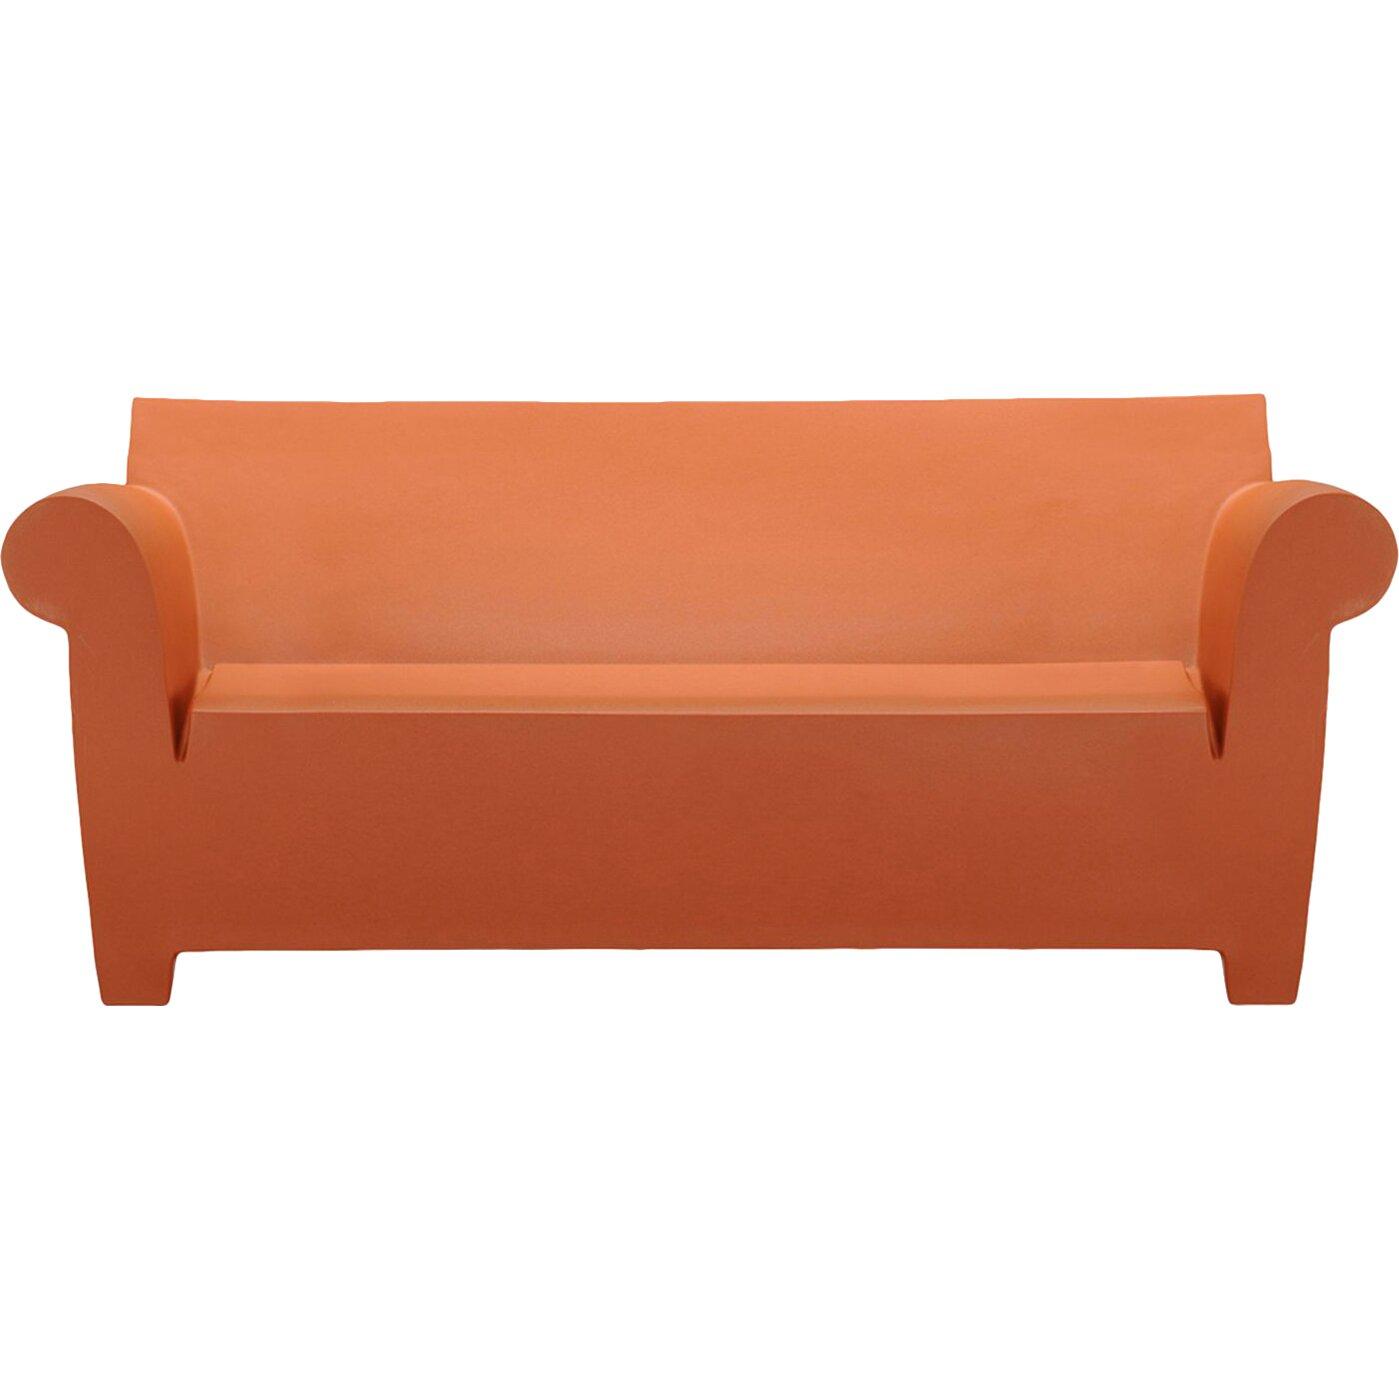 kartell bubble club sofa review